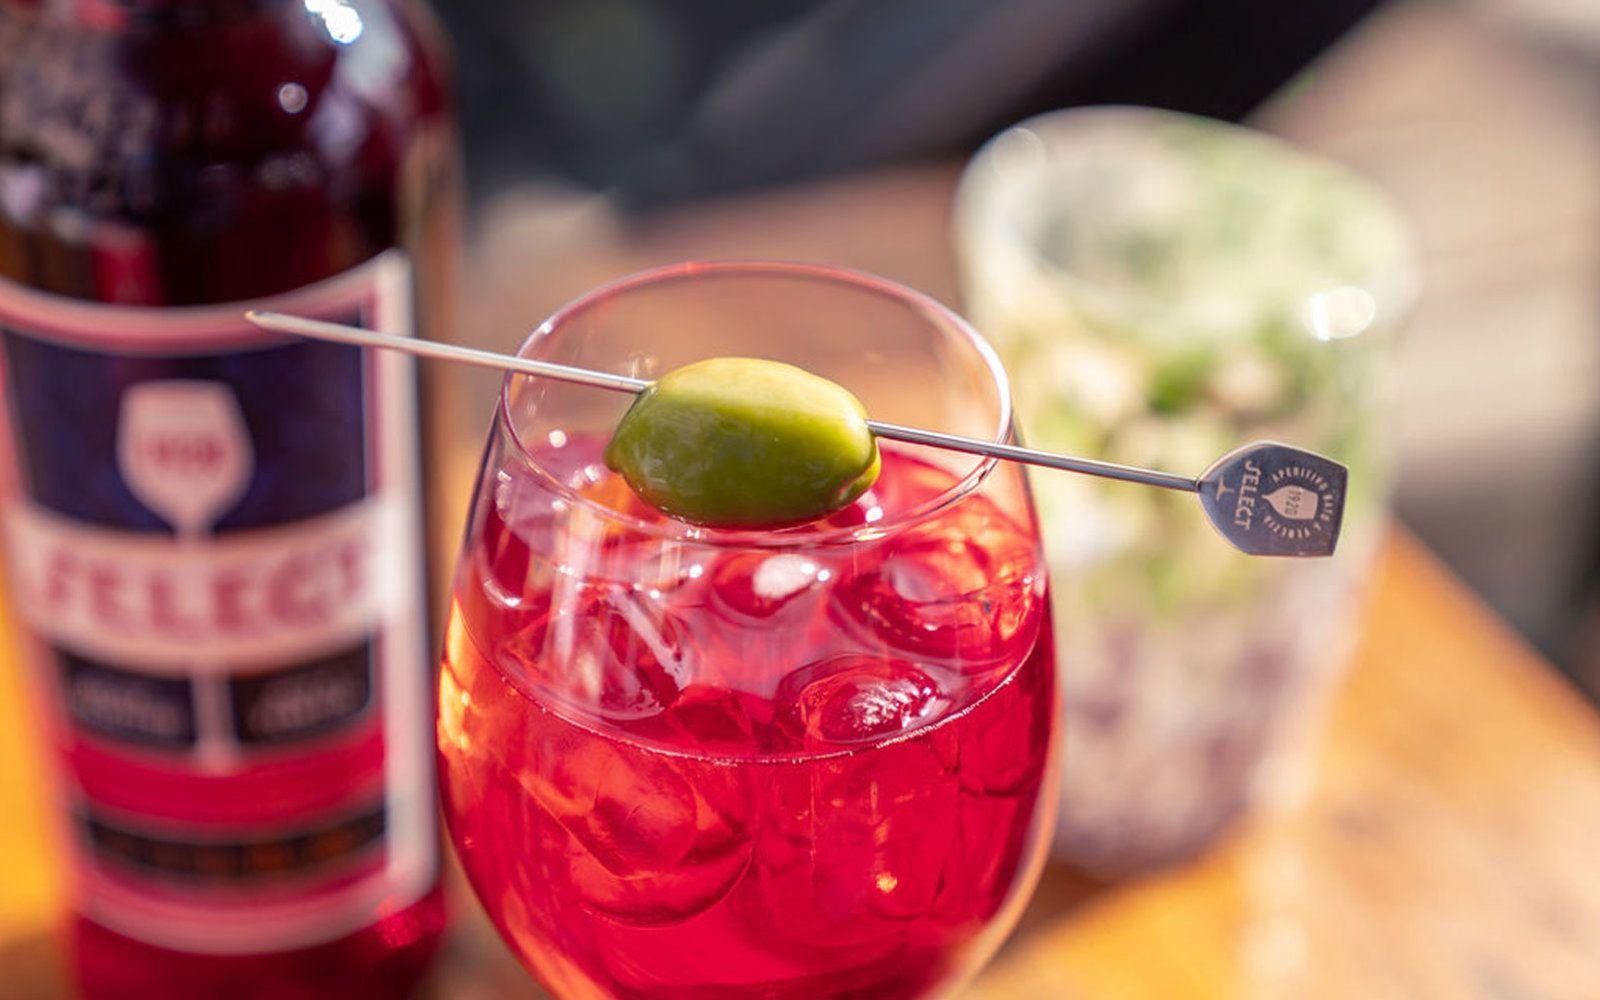 Where To Drink Select Spritz In Venice Italy In 2020 Venice Drinks Spritz